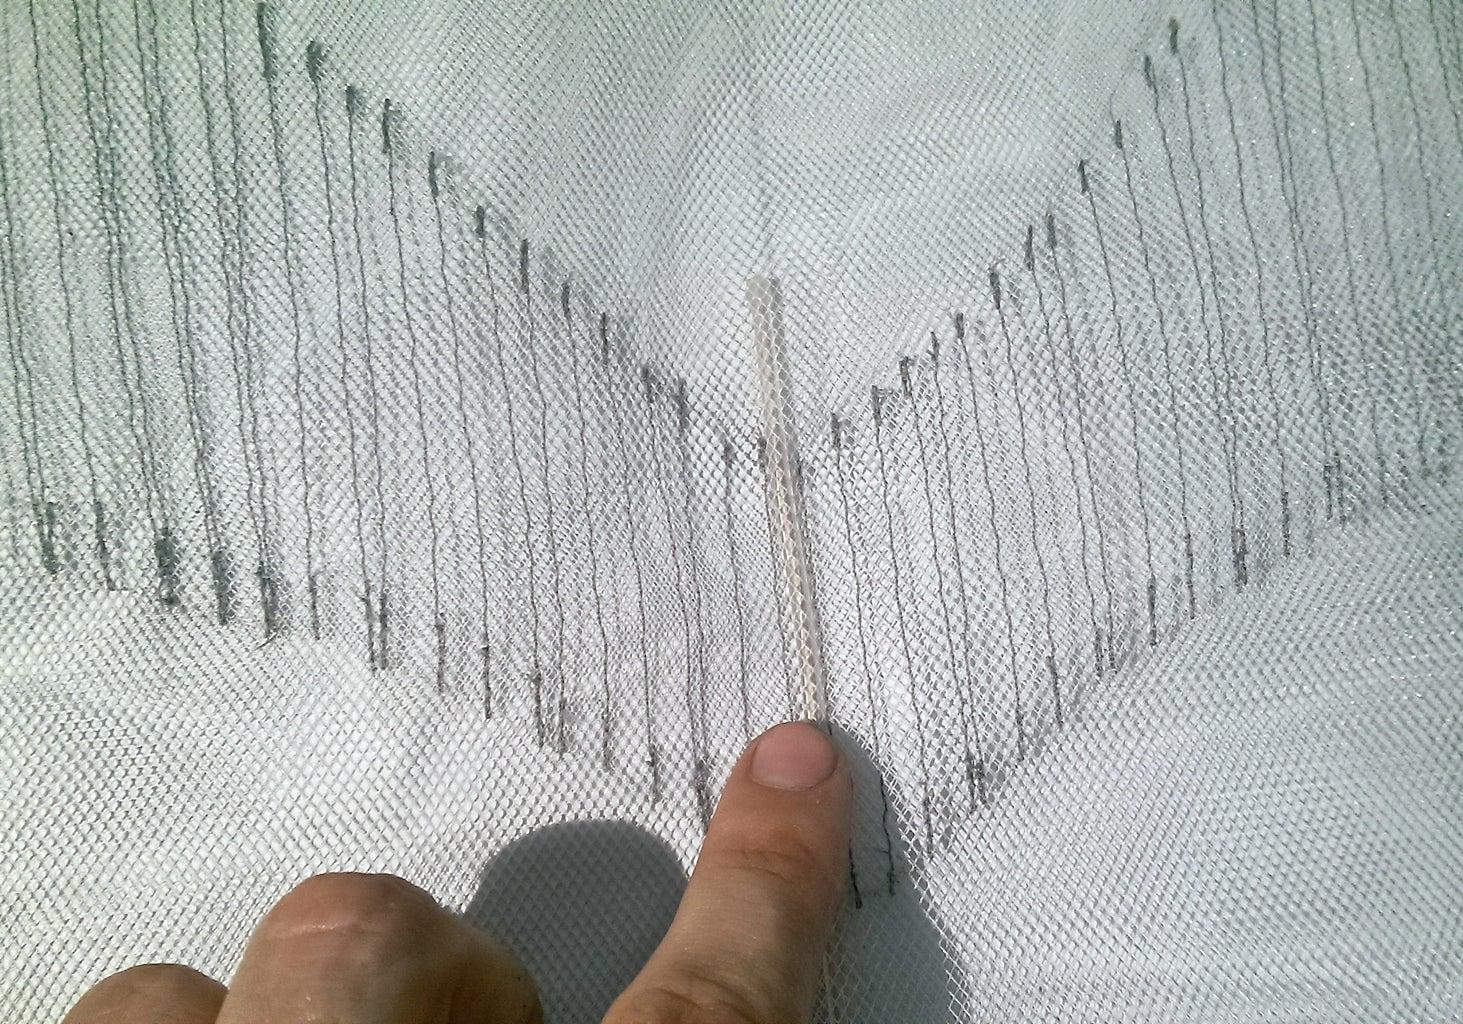 Threading the El Wire